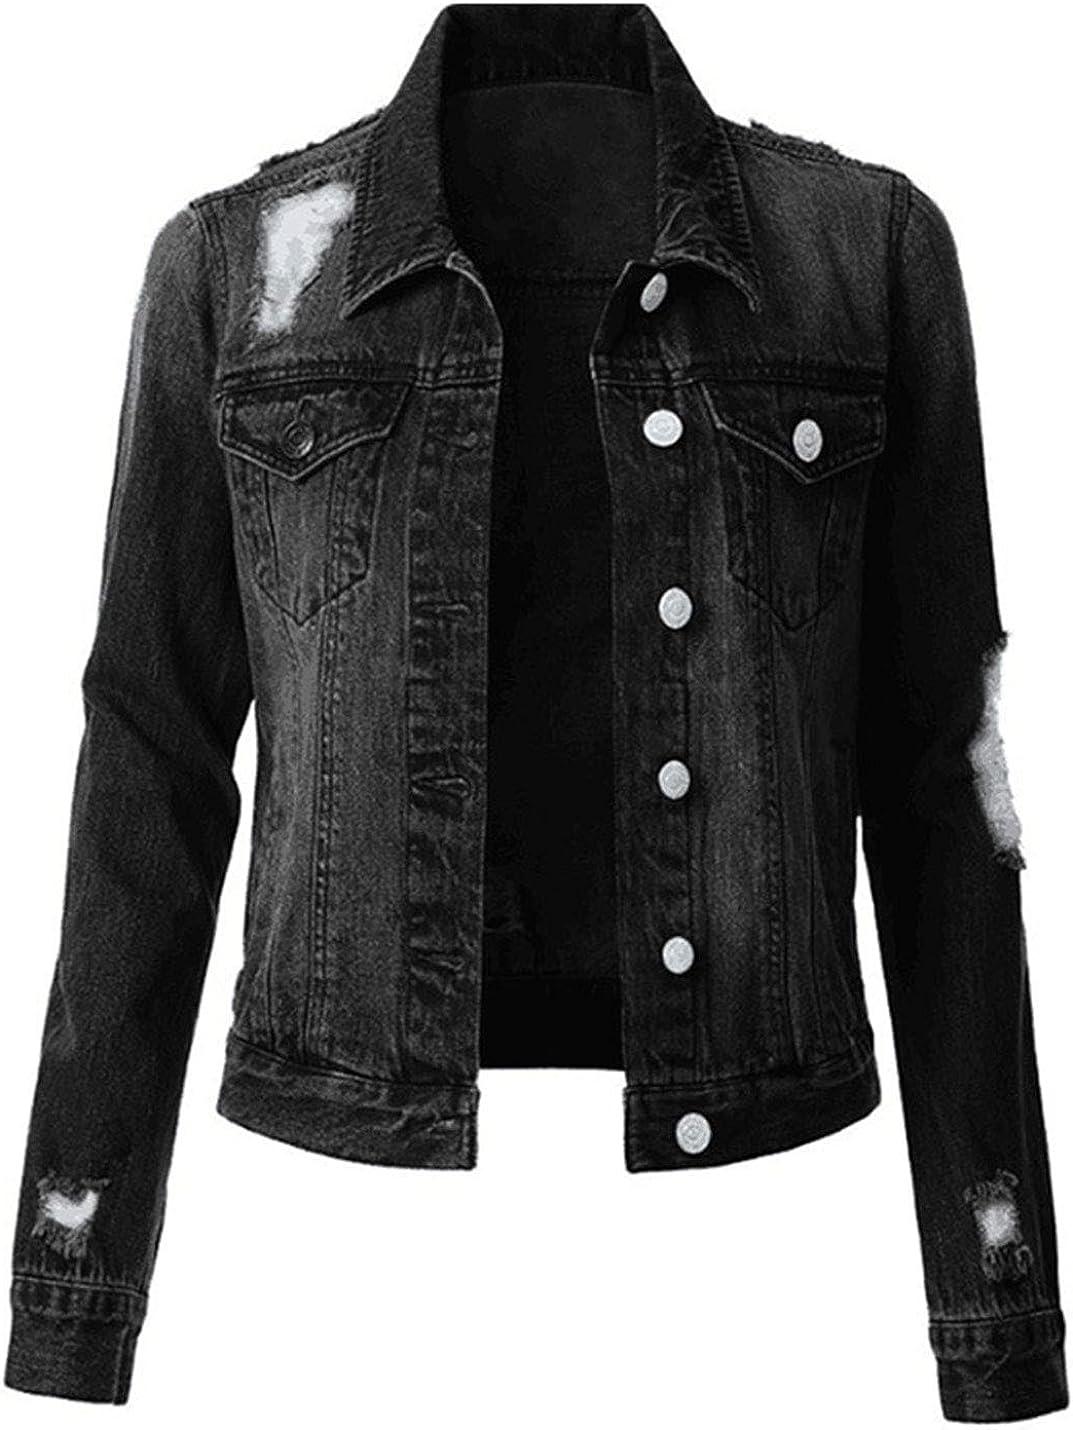 SCUSTY Women's Ripped Denim Jacket Long Sleeve Button Down Distressed Jean Jacket